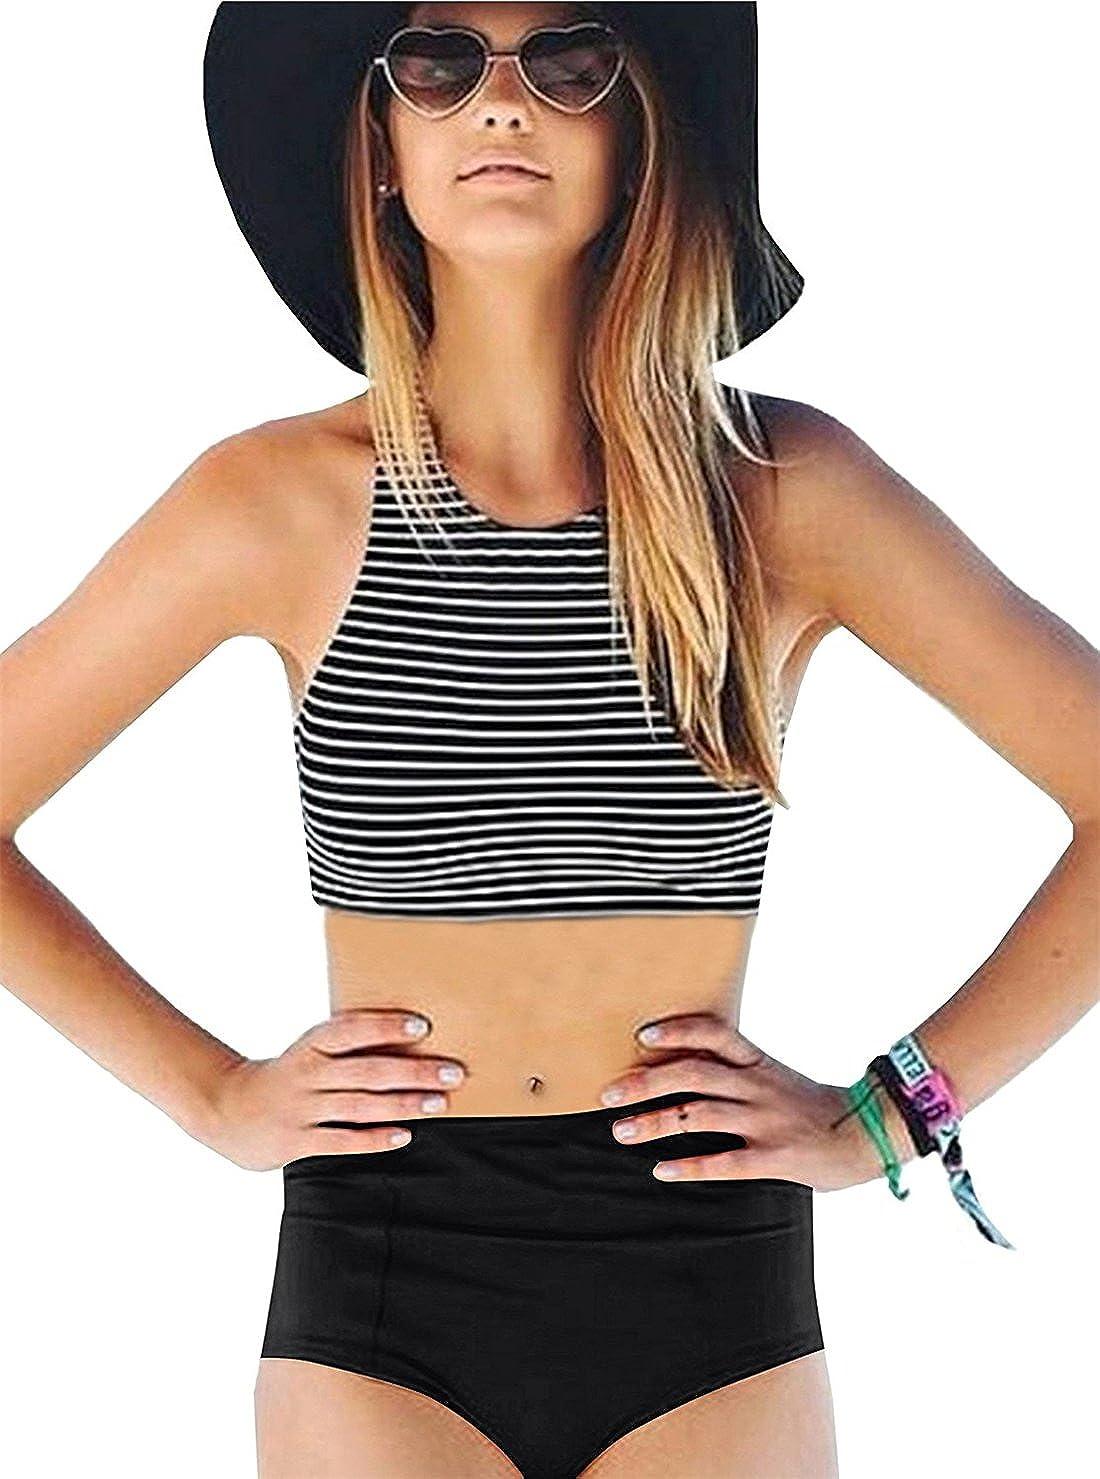 a160e9ecc2f60 Fashion retro style with high neck striped racerback bikini top and high  waisted solid color bikini bottom which has a nice coverage